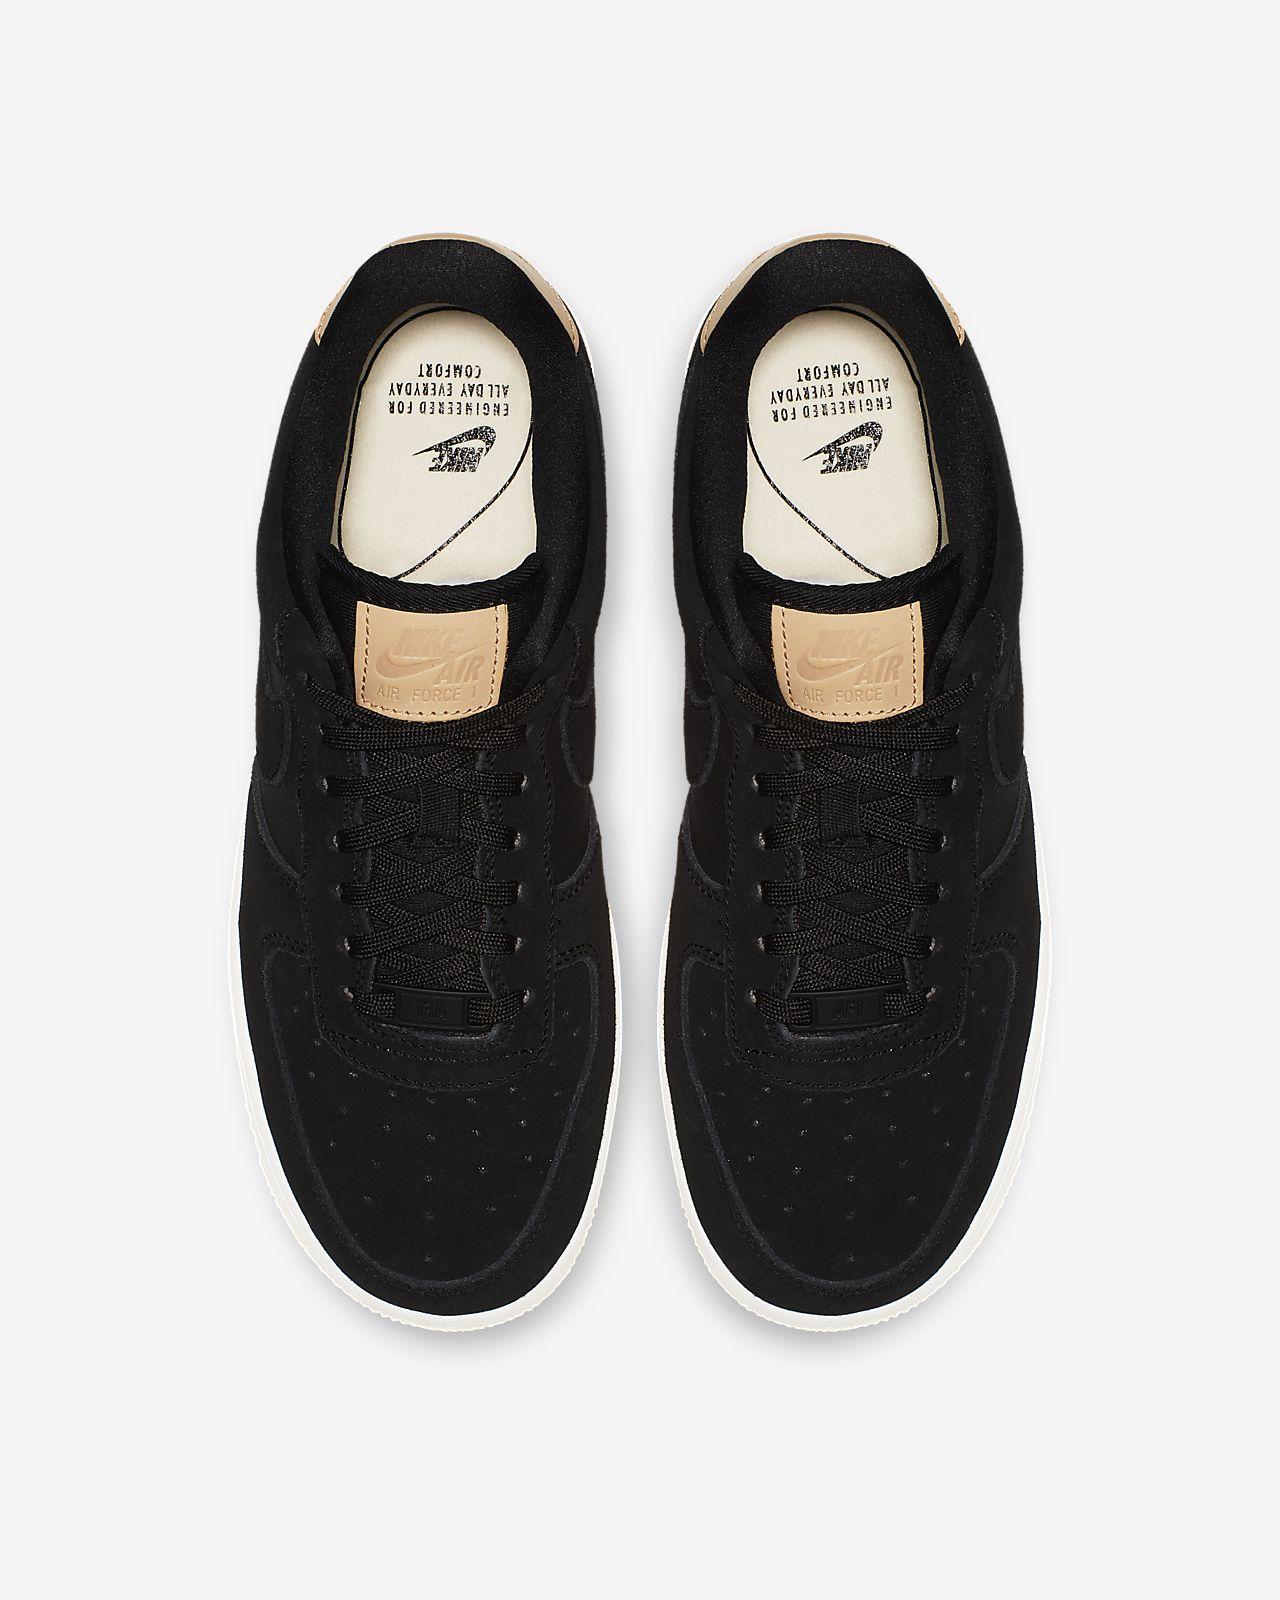 online retailer 967e4 2d608 ... Sko Nike Air Force 1  07 Low Premium för kvinnor